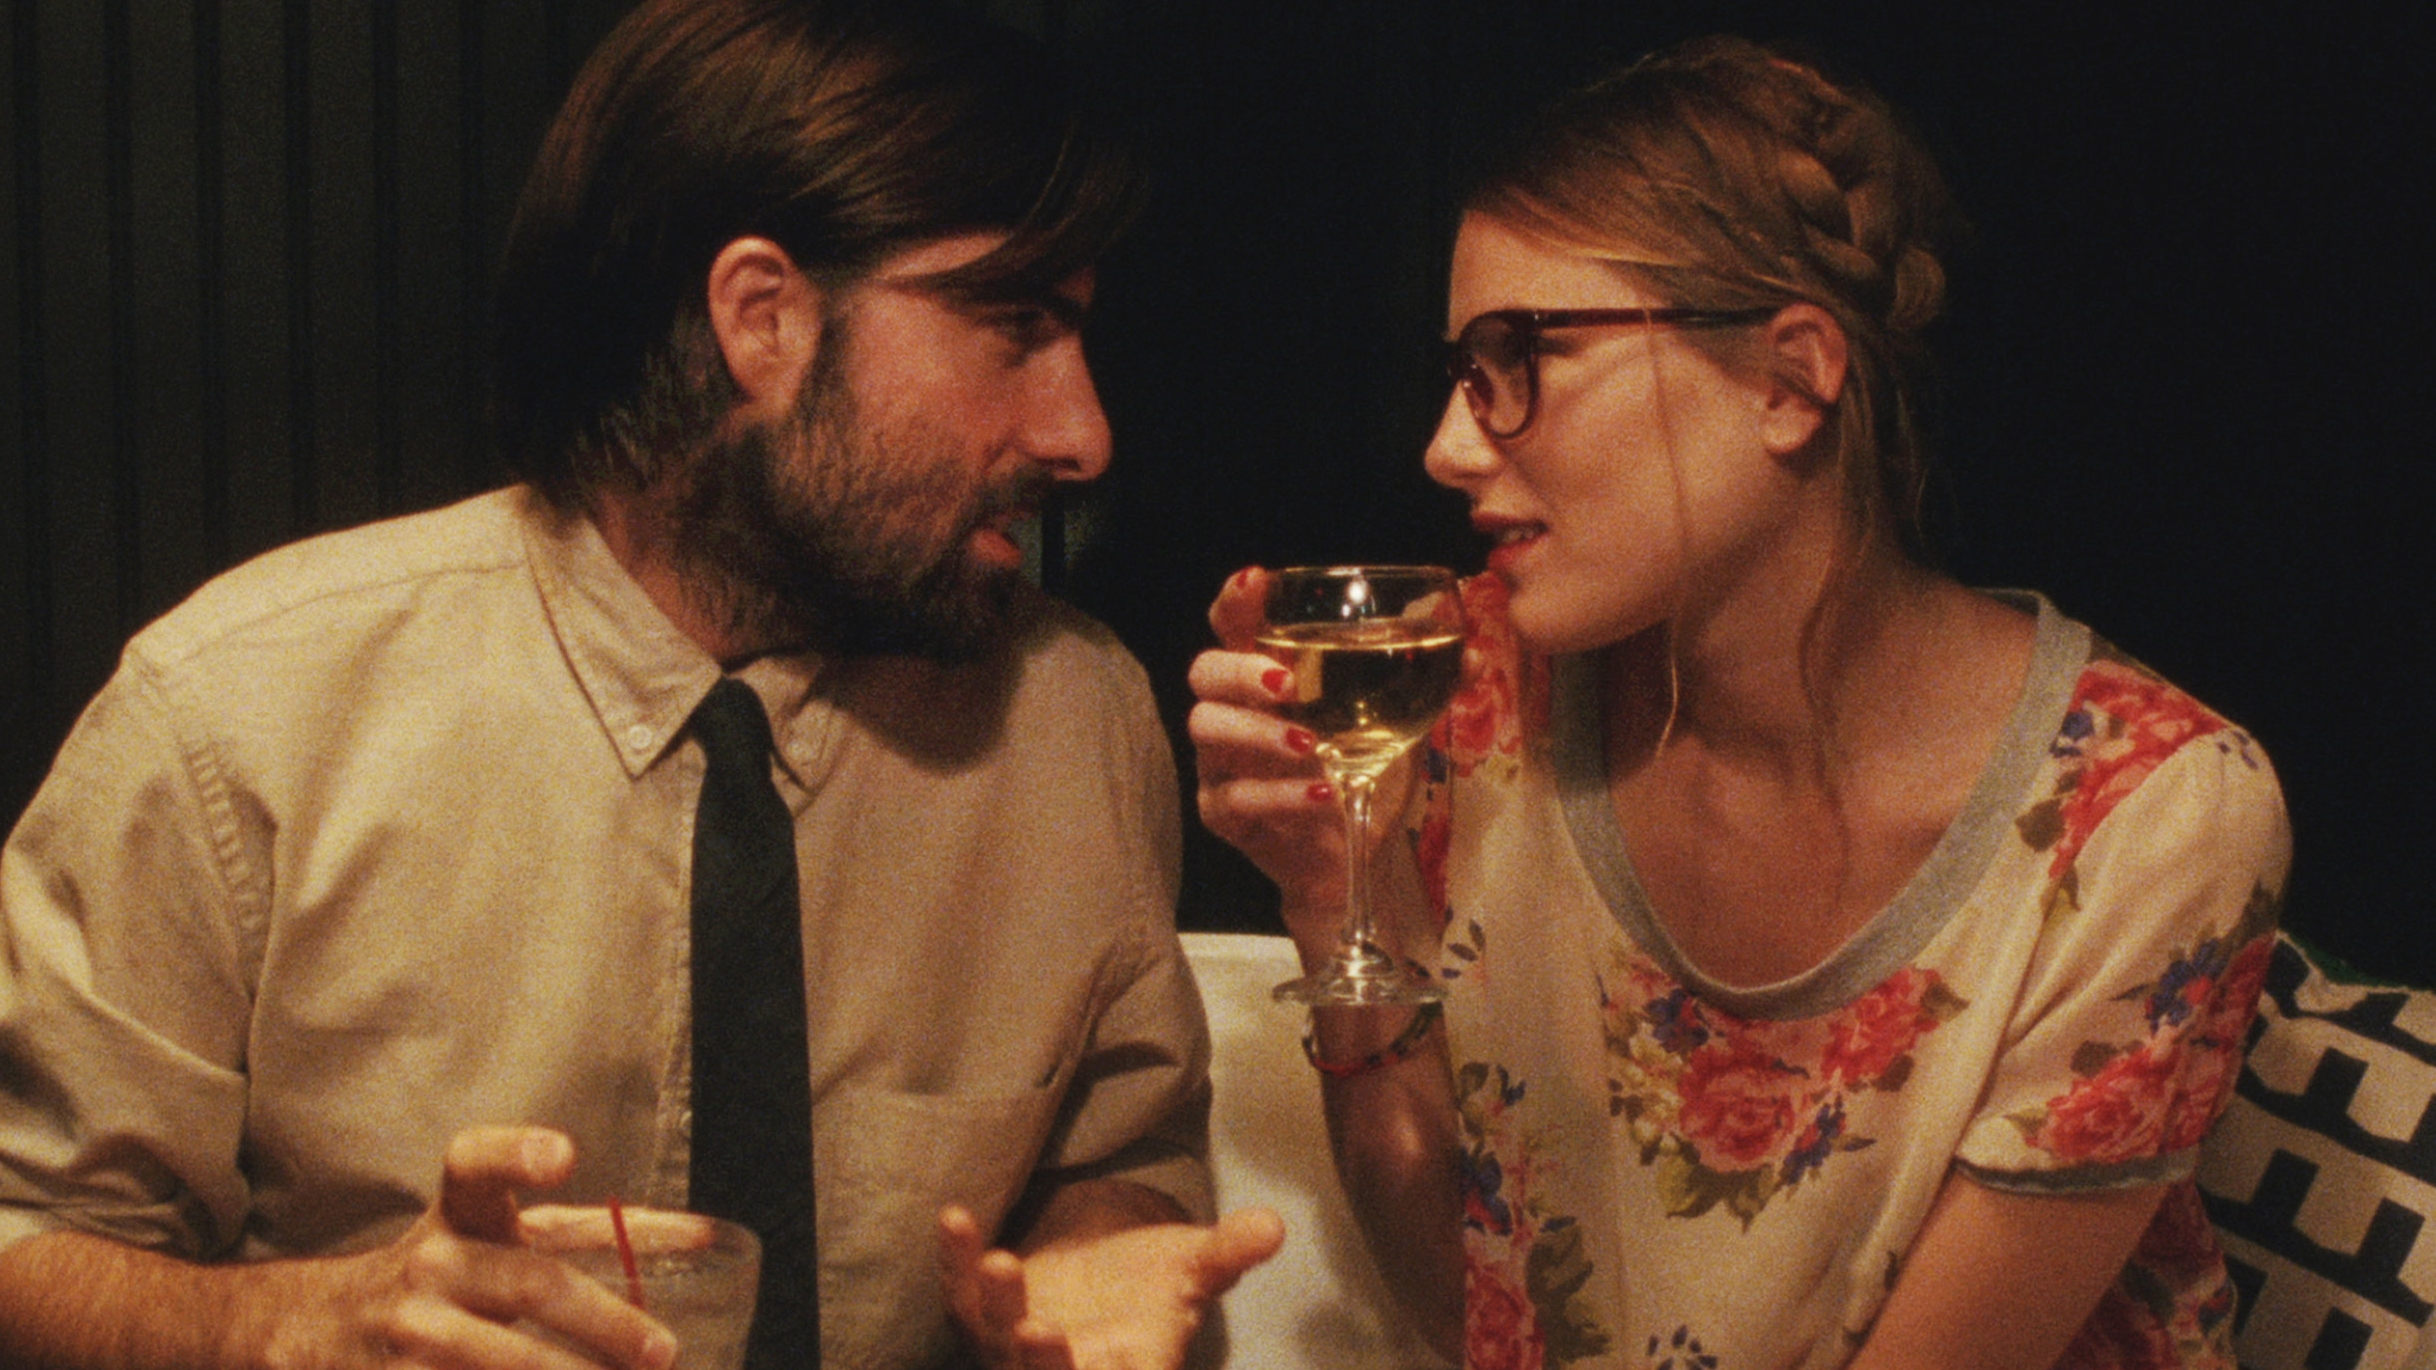 Jason-Schwartzman-and-Dree-Hemingwaty-in-Listen-Up-Philip-distributed-by-Tribeca-Film..jpg